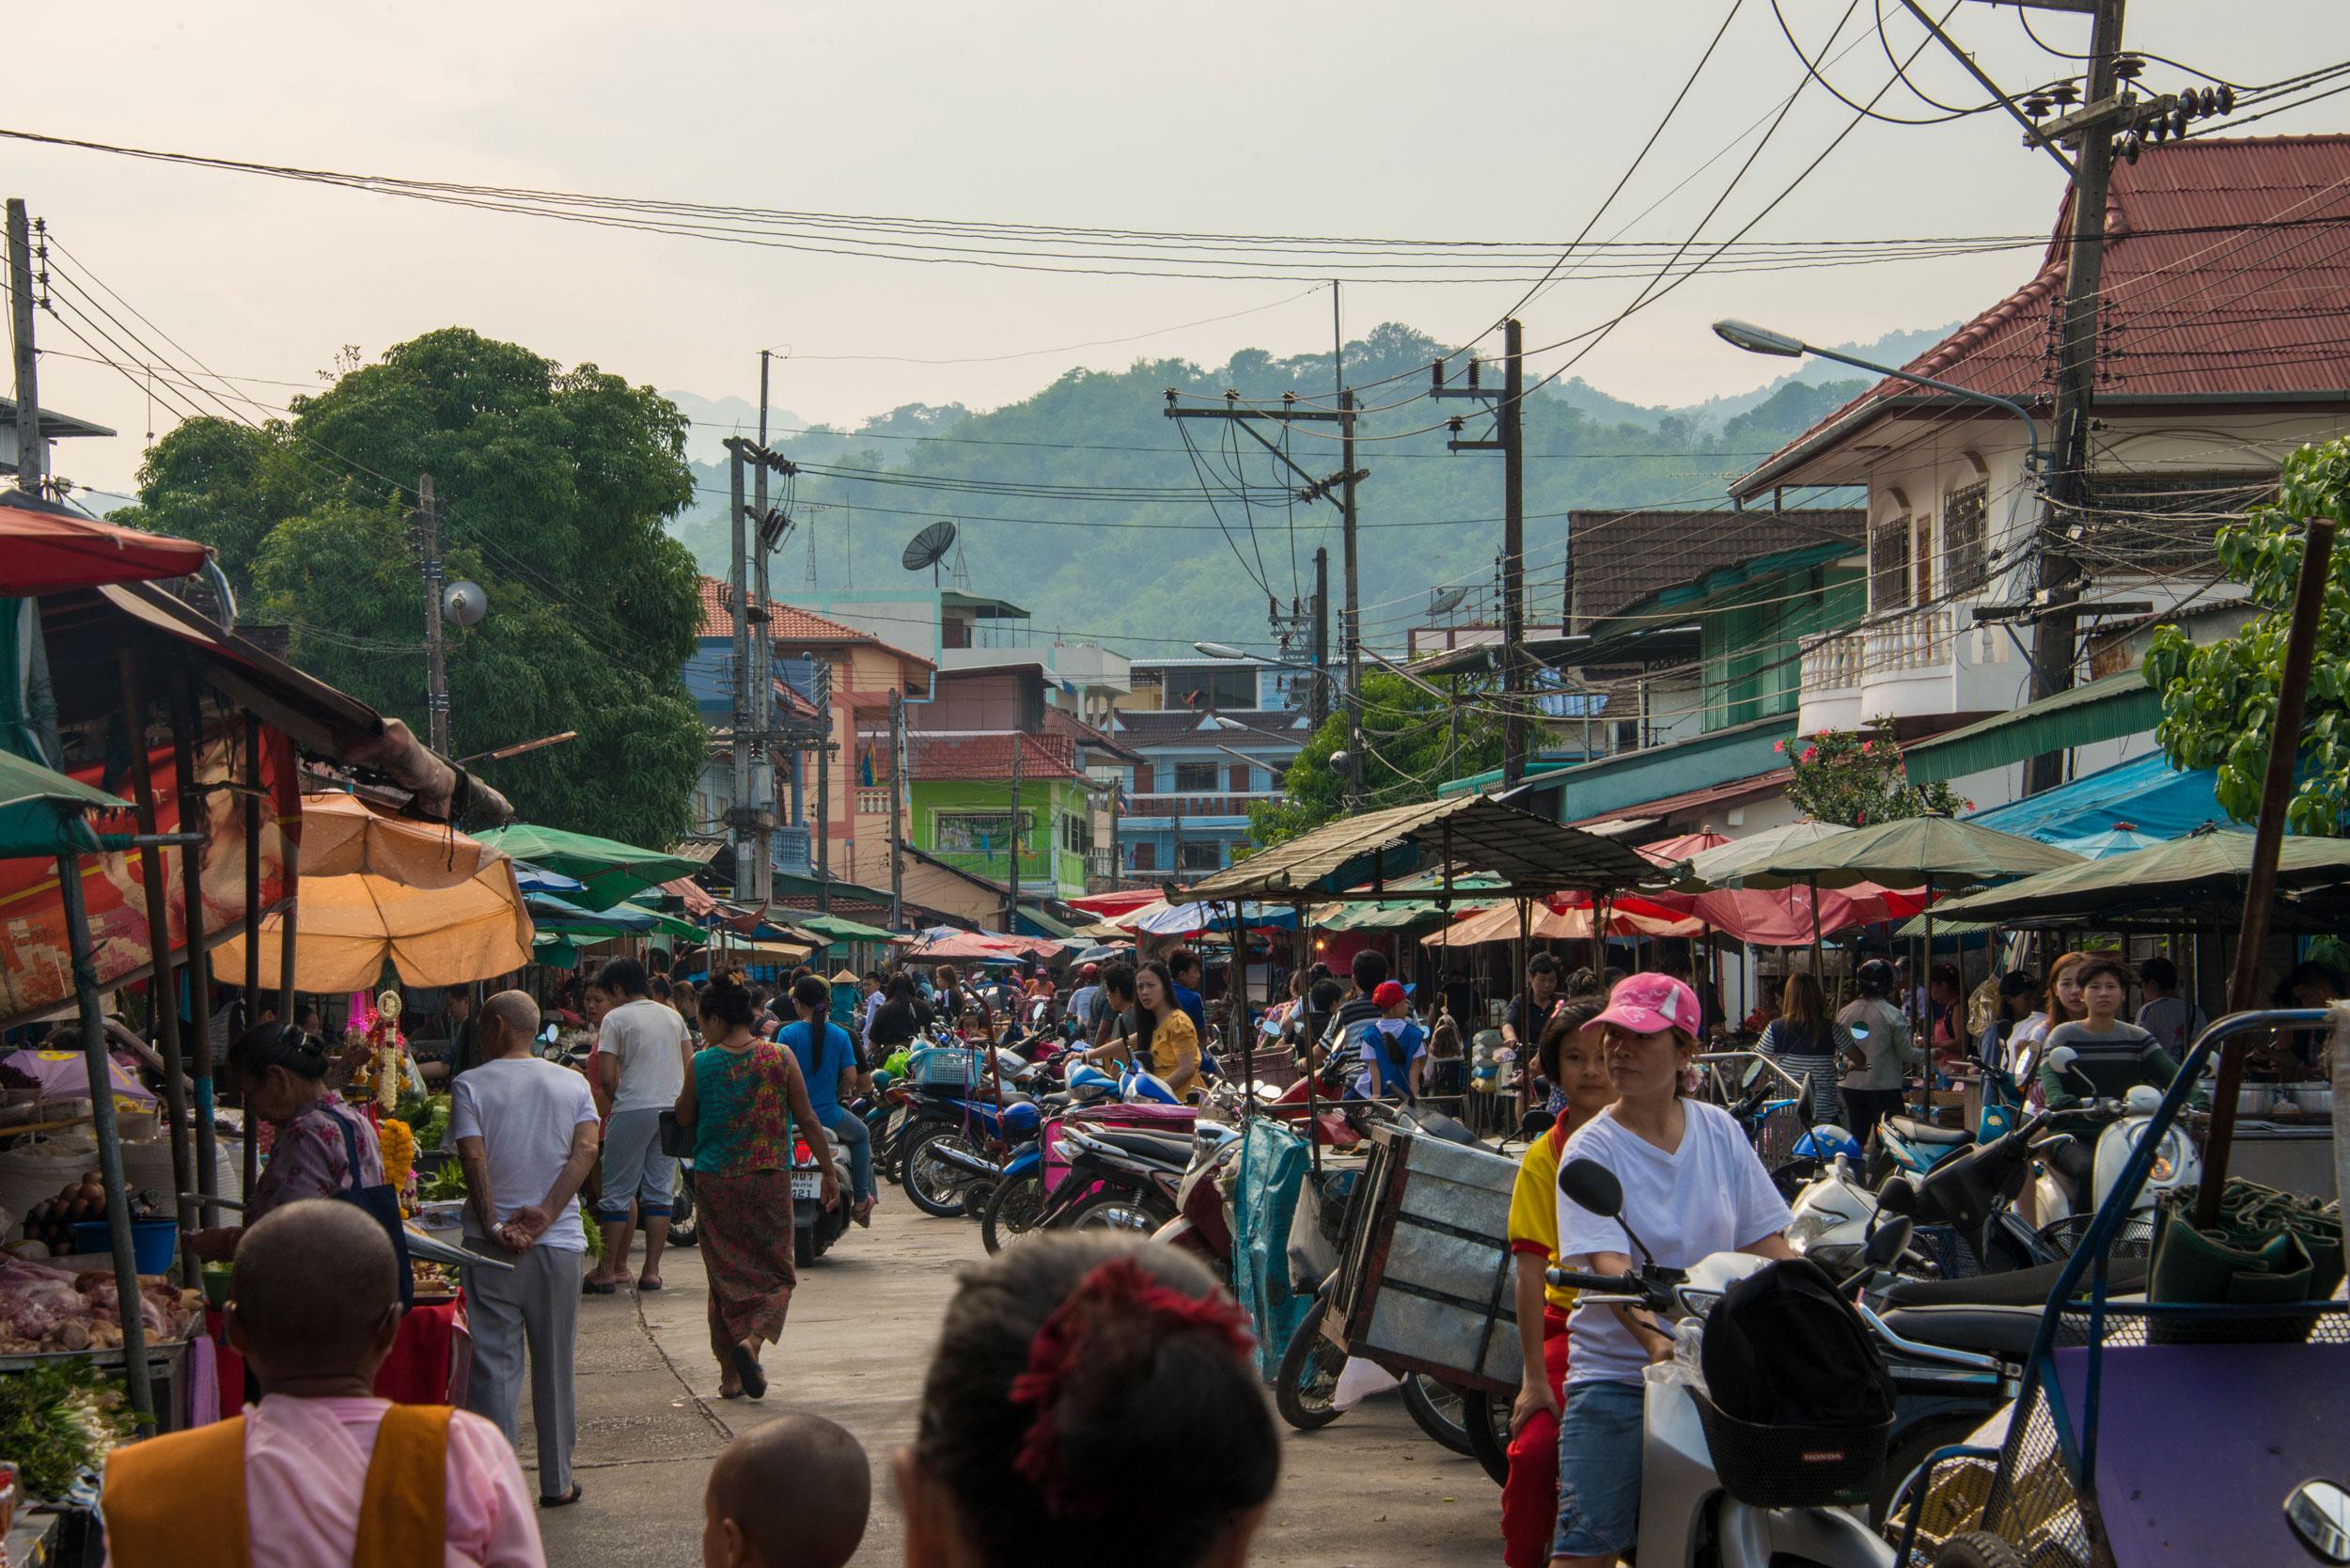 Maesai-Thailand-Market-Bryan-Matuskey